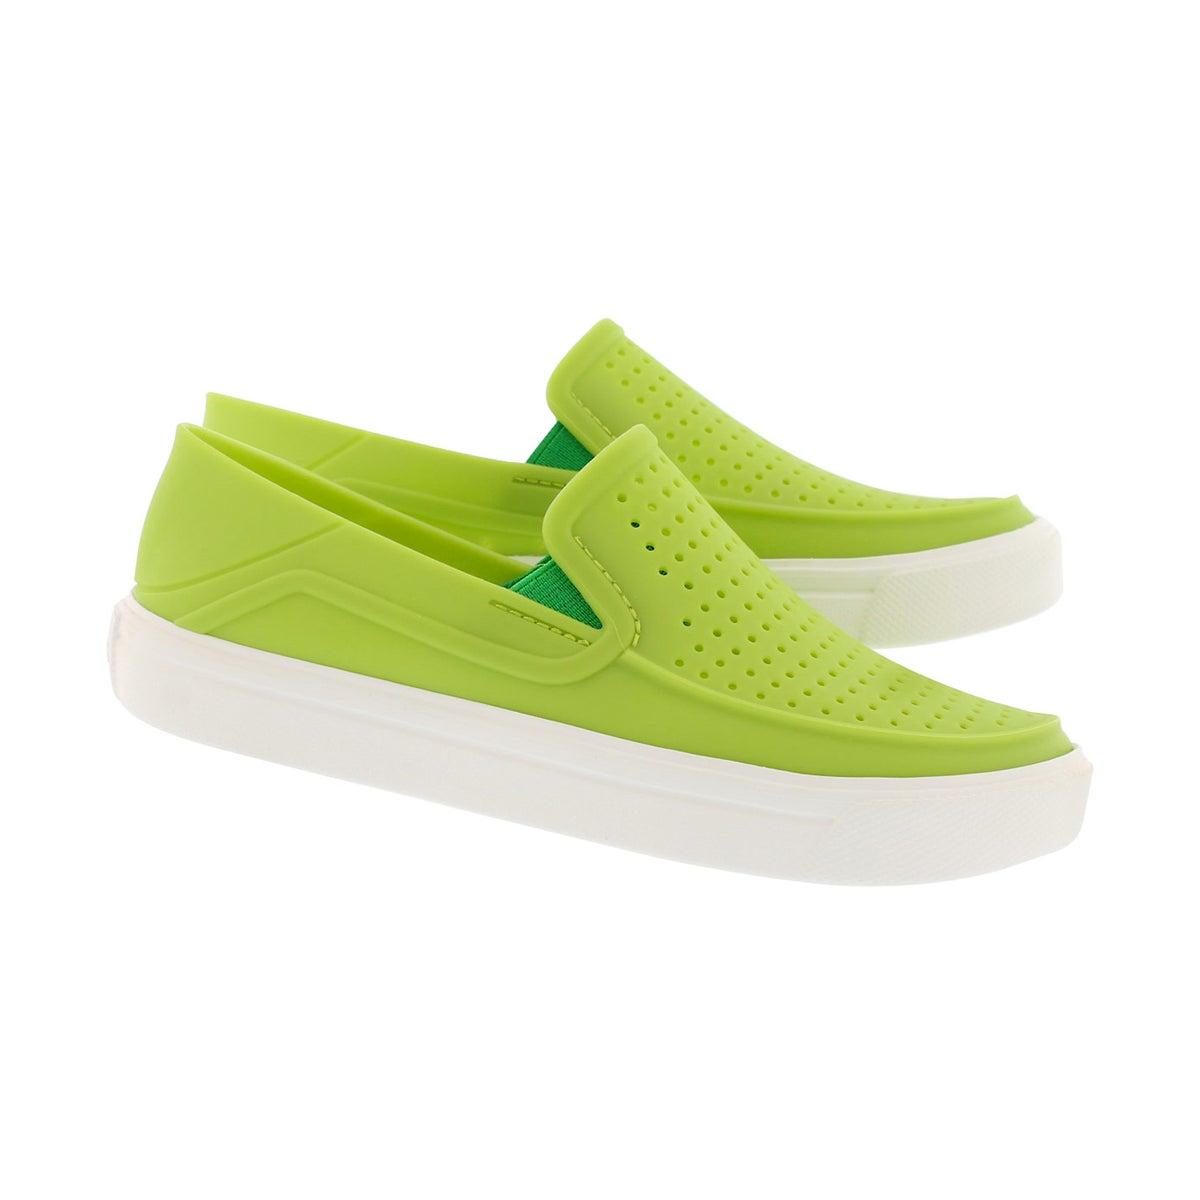 Bys CitiLane Roka volt green slip on